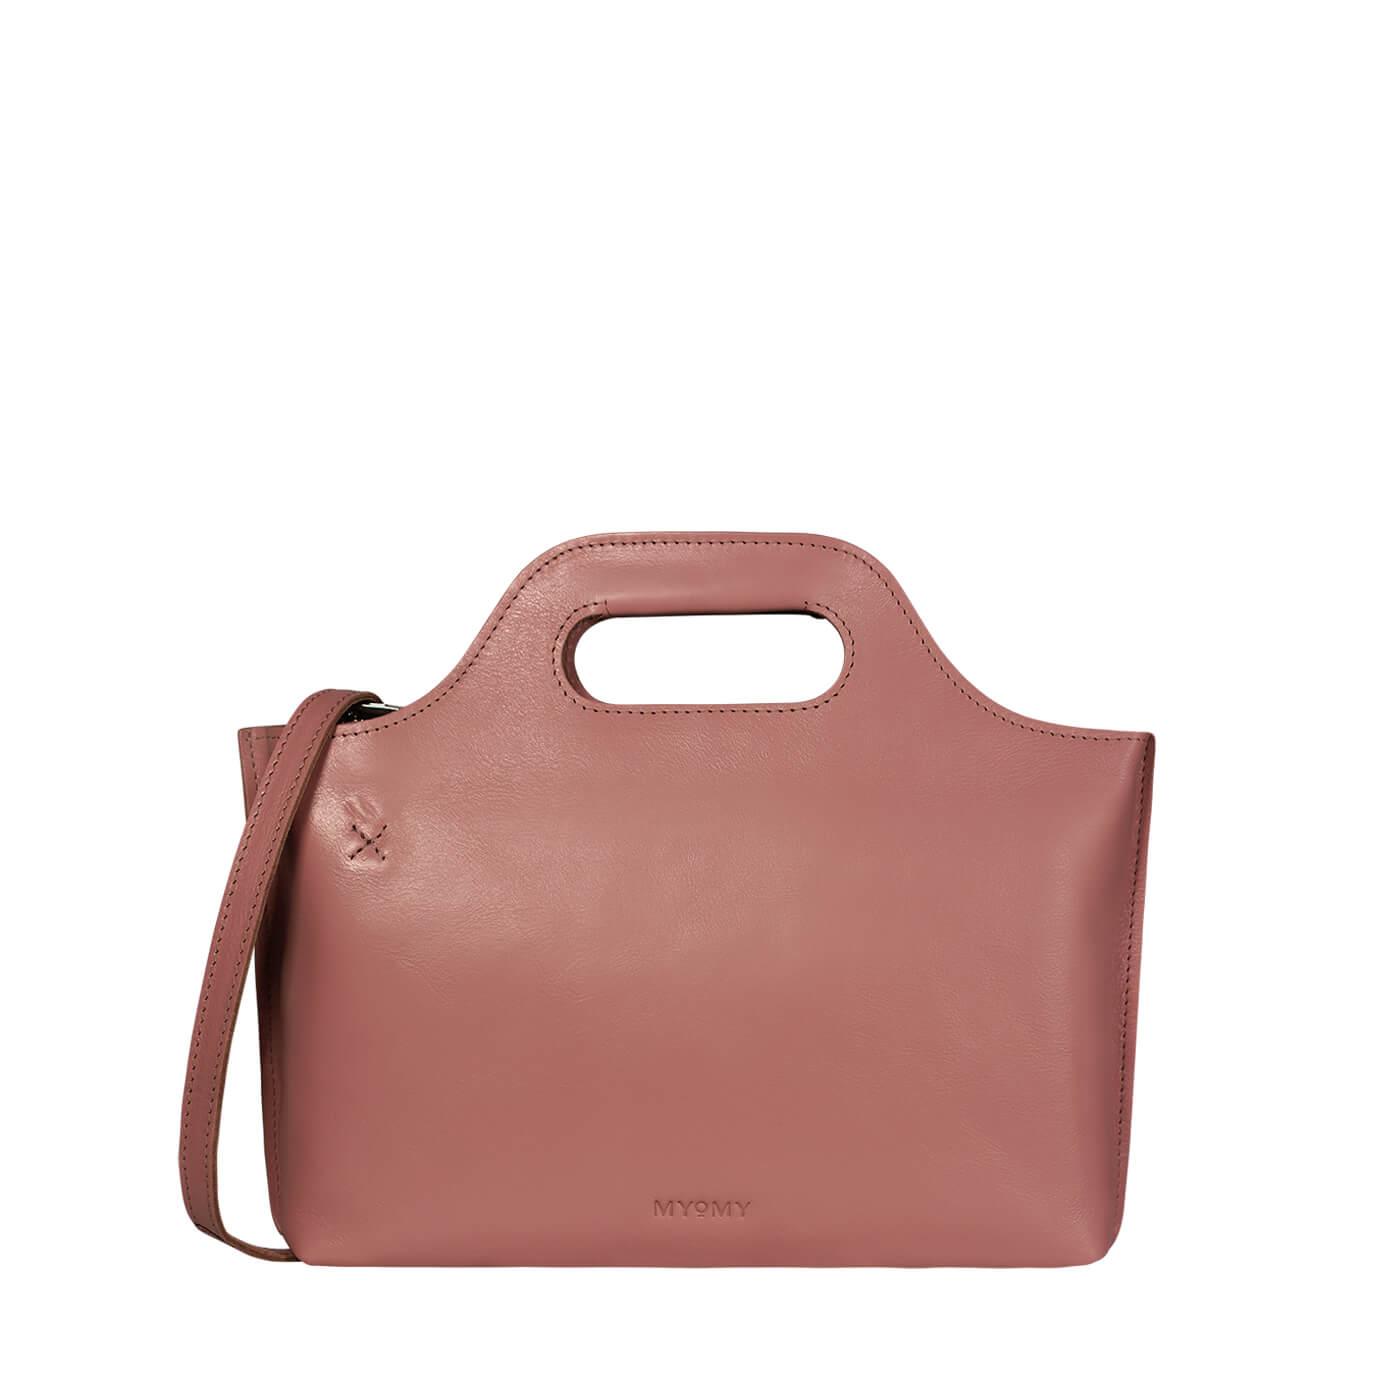 MY CARRY BAG Mini - hunter waxy pink